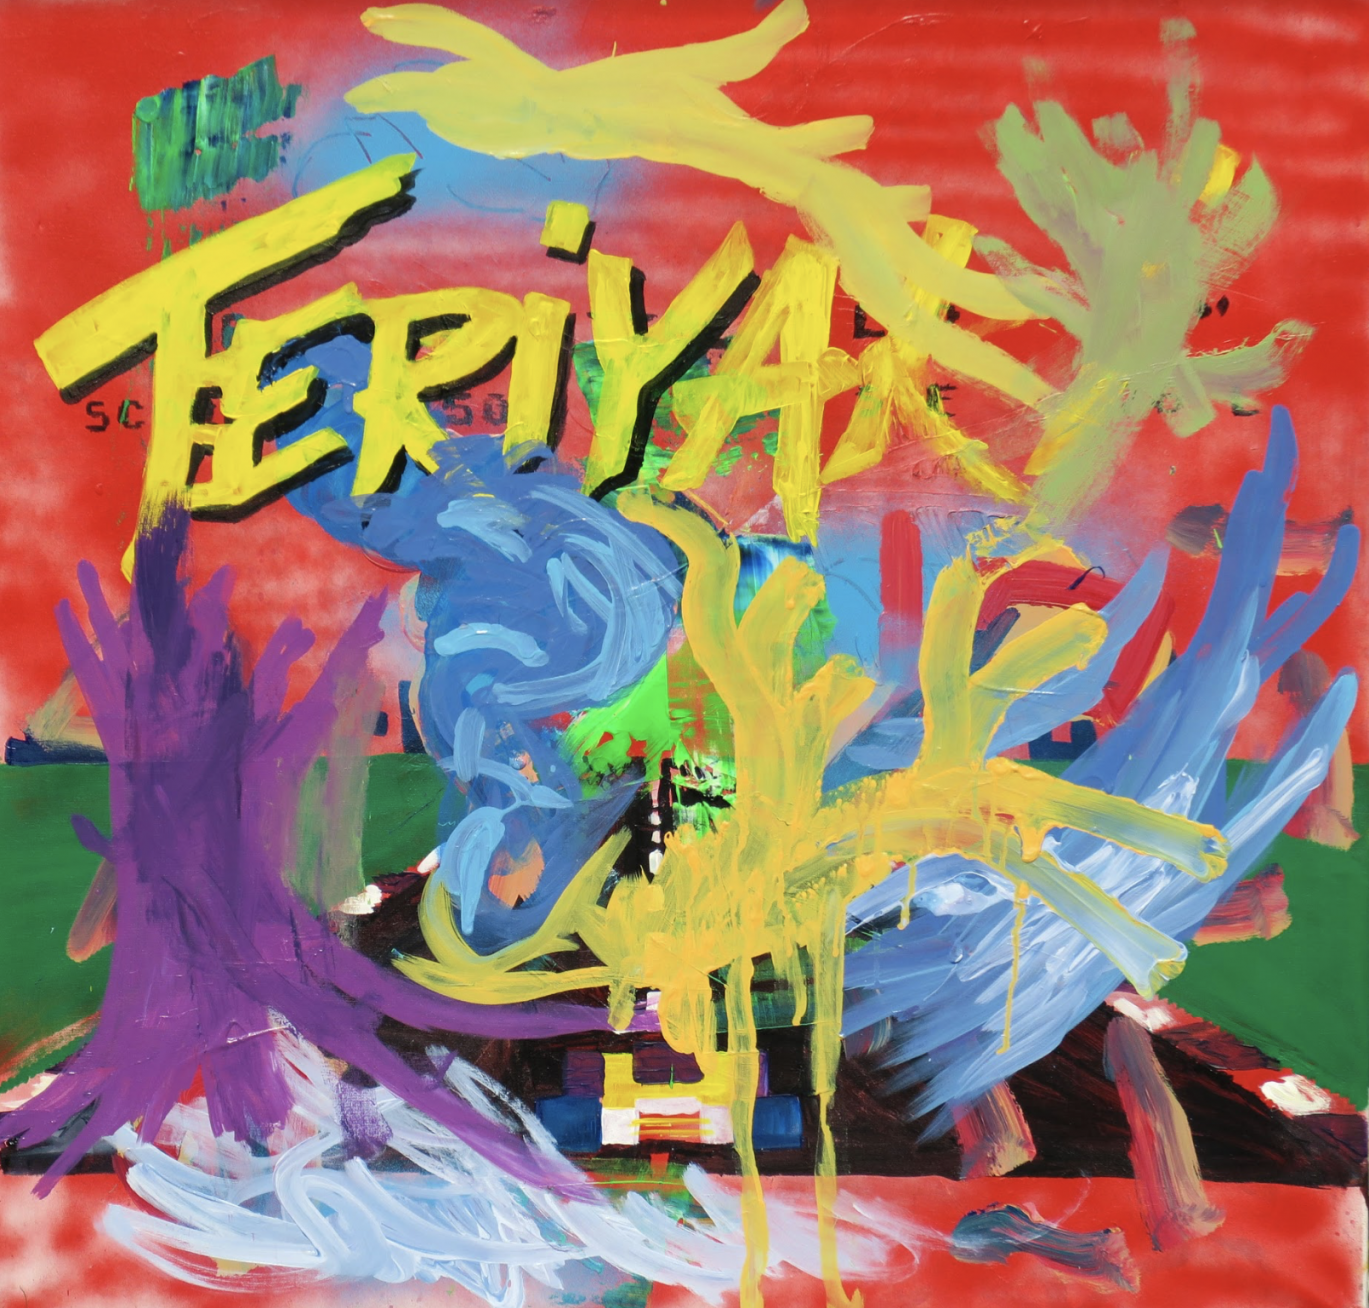 Teriyaki (2017) - Marcos Gonzalez Cutre - Jantus